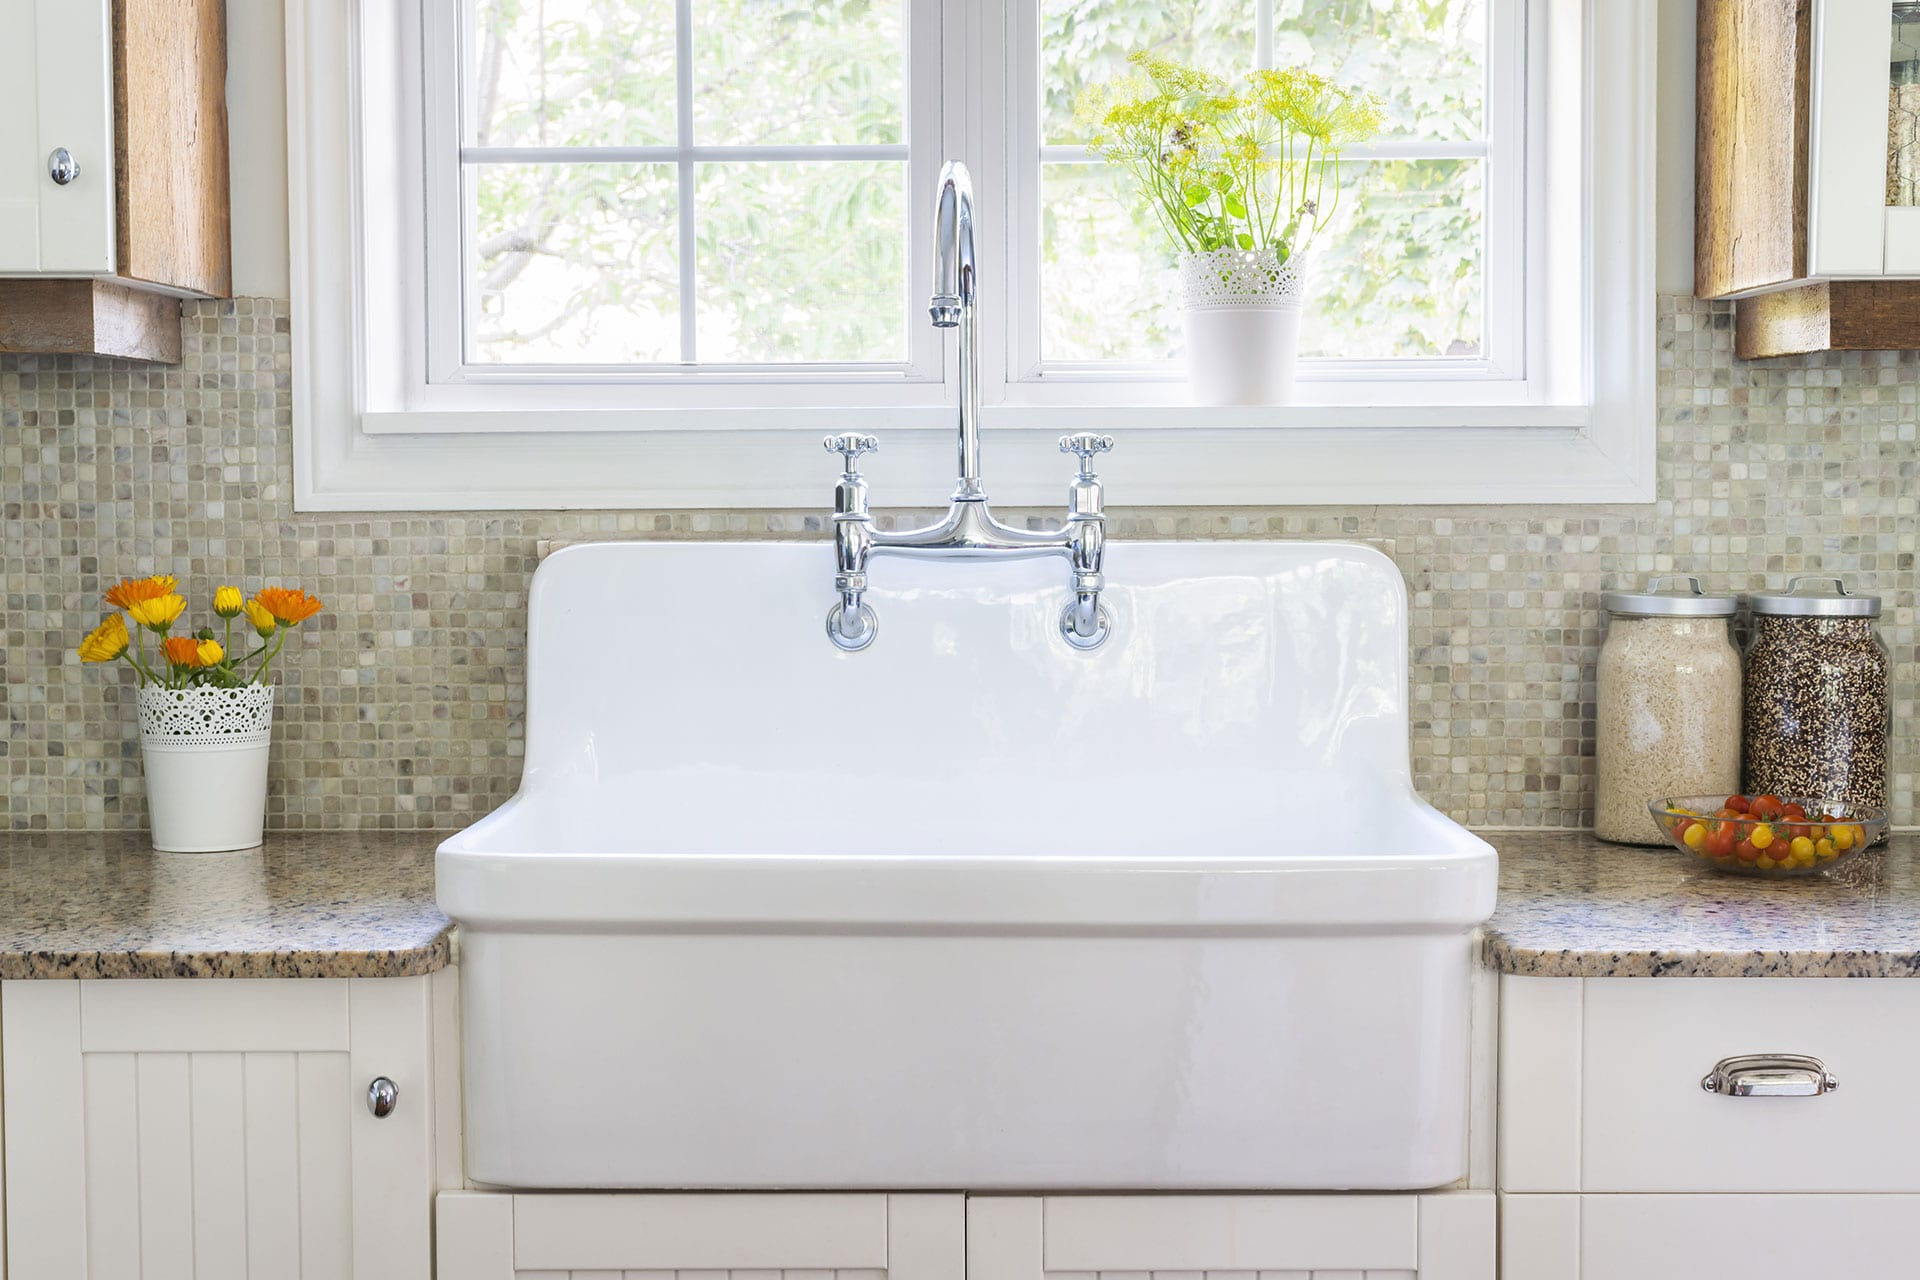 How to Paint Your Kitchen Backsplash | Blog | Arizona Painting Company